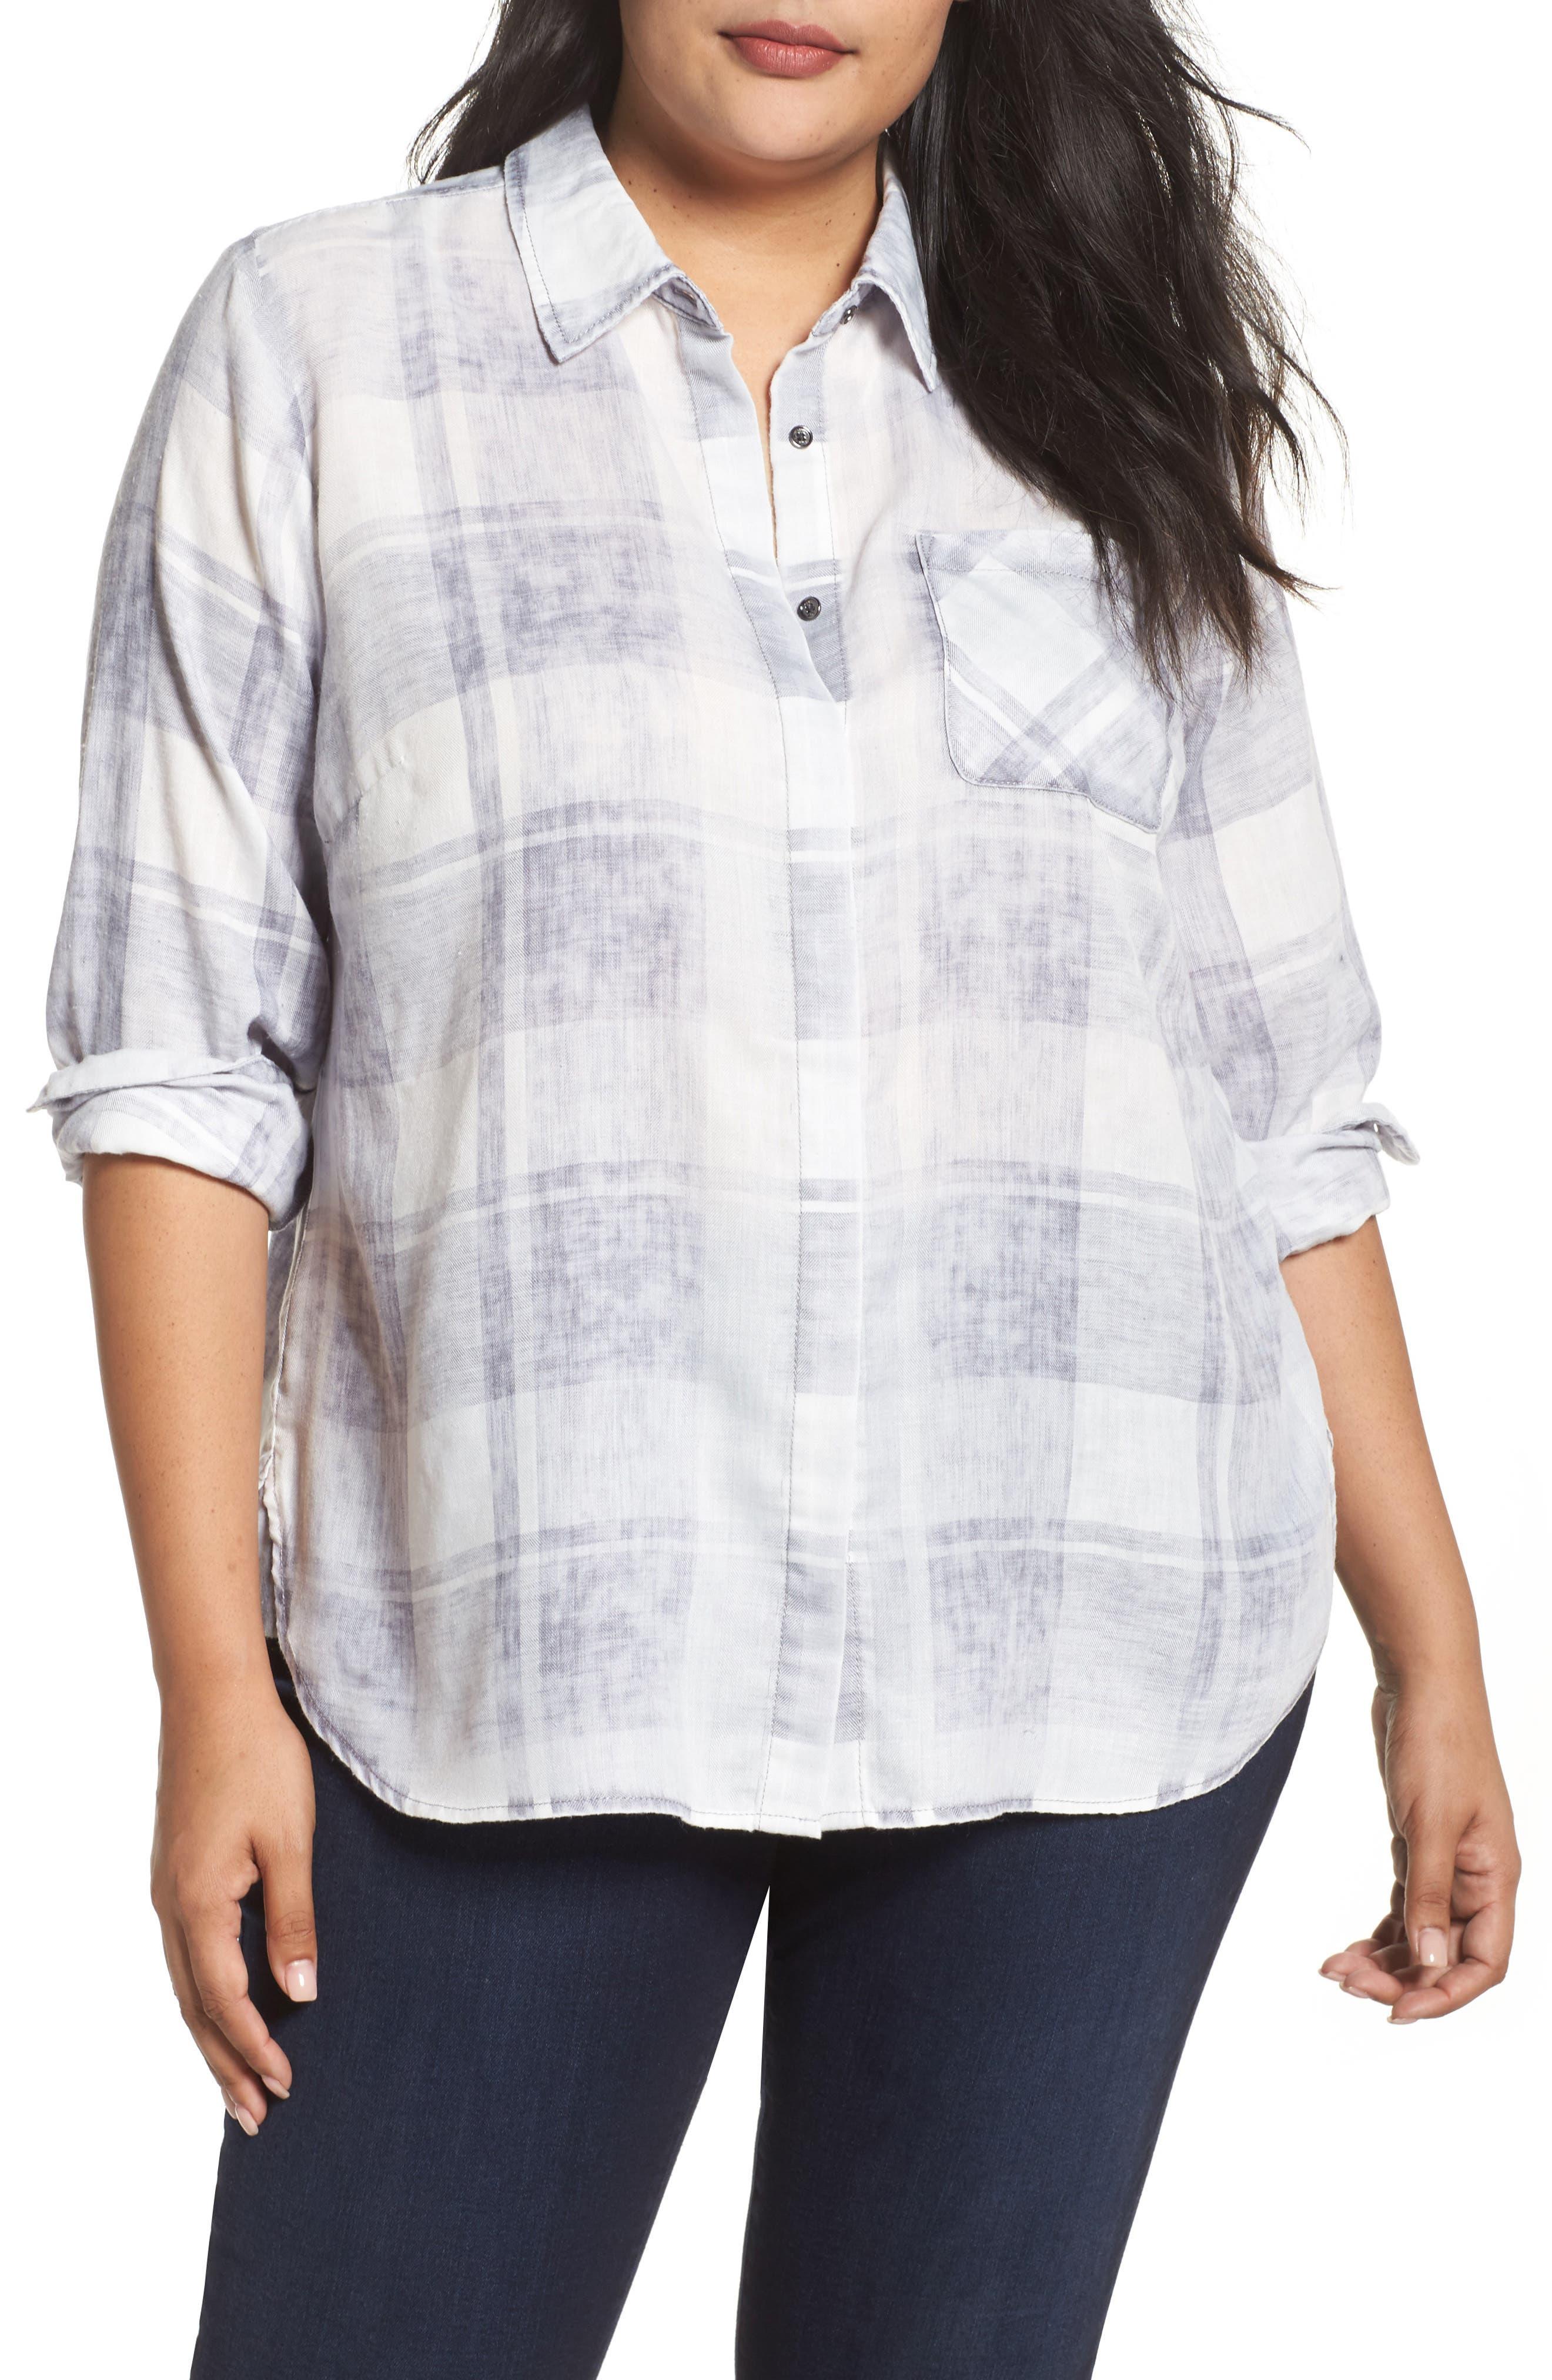 Alternate Image 1 Selected - Two by Vince Camuto Quaint Plaid Button Down Shirt (Plus Size)